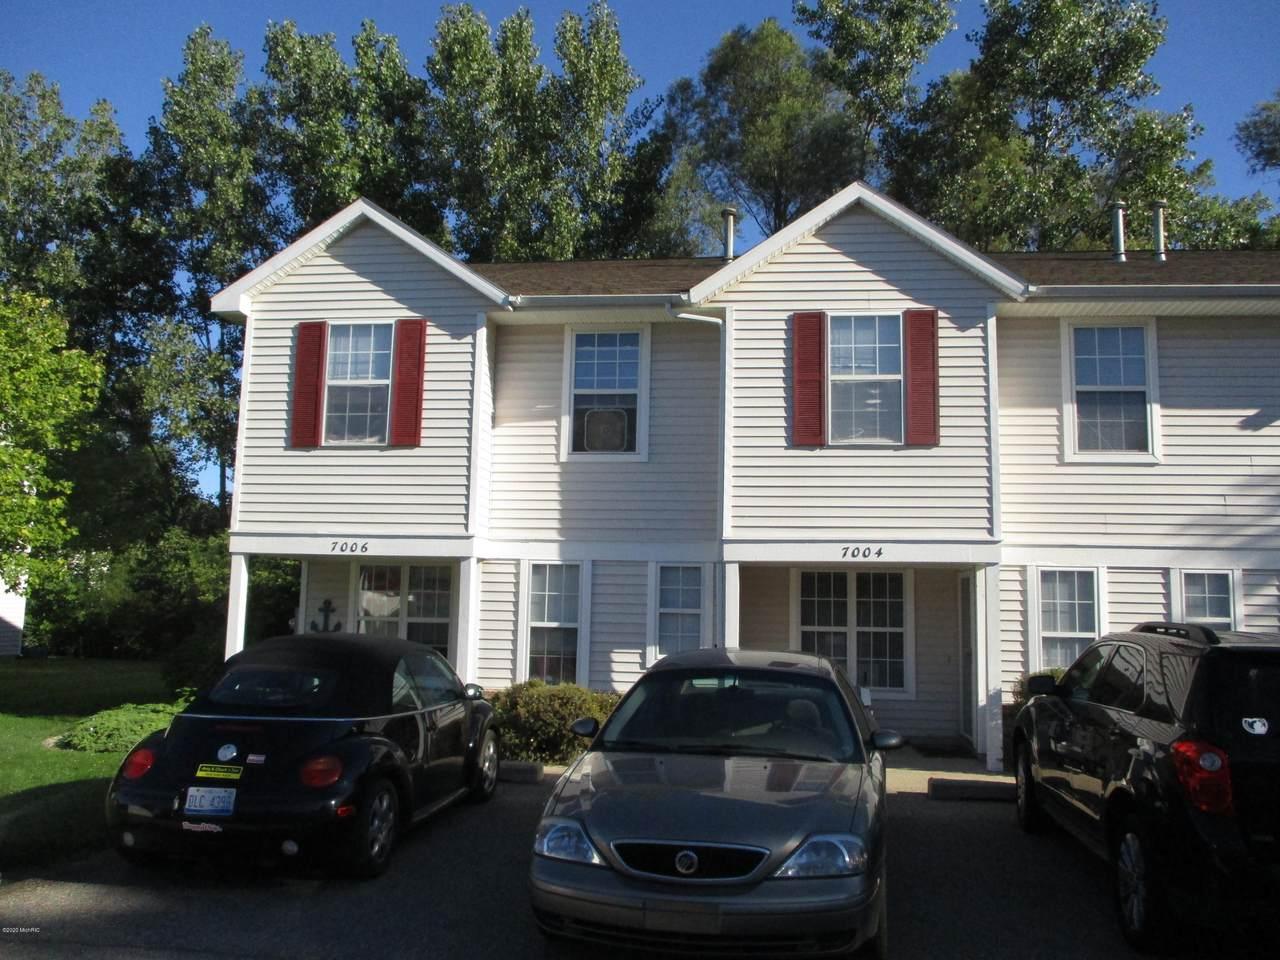 7006 Cannon Place Drive - Photo 1